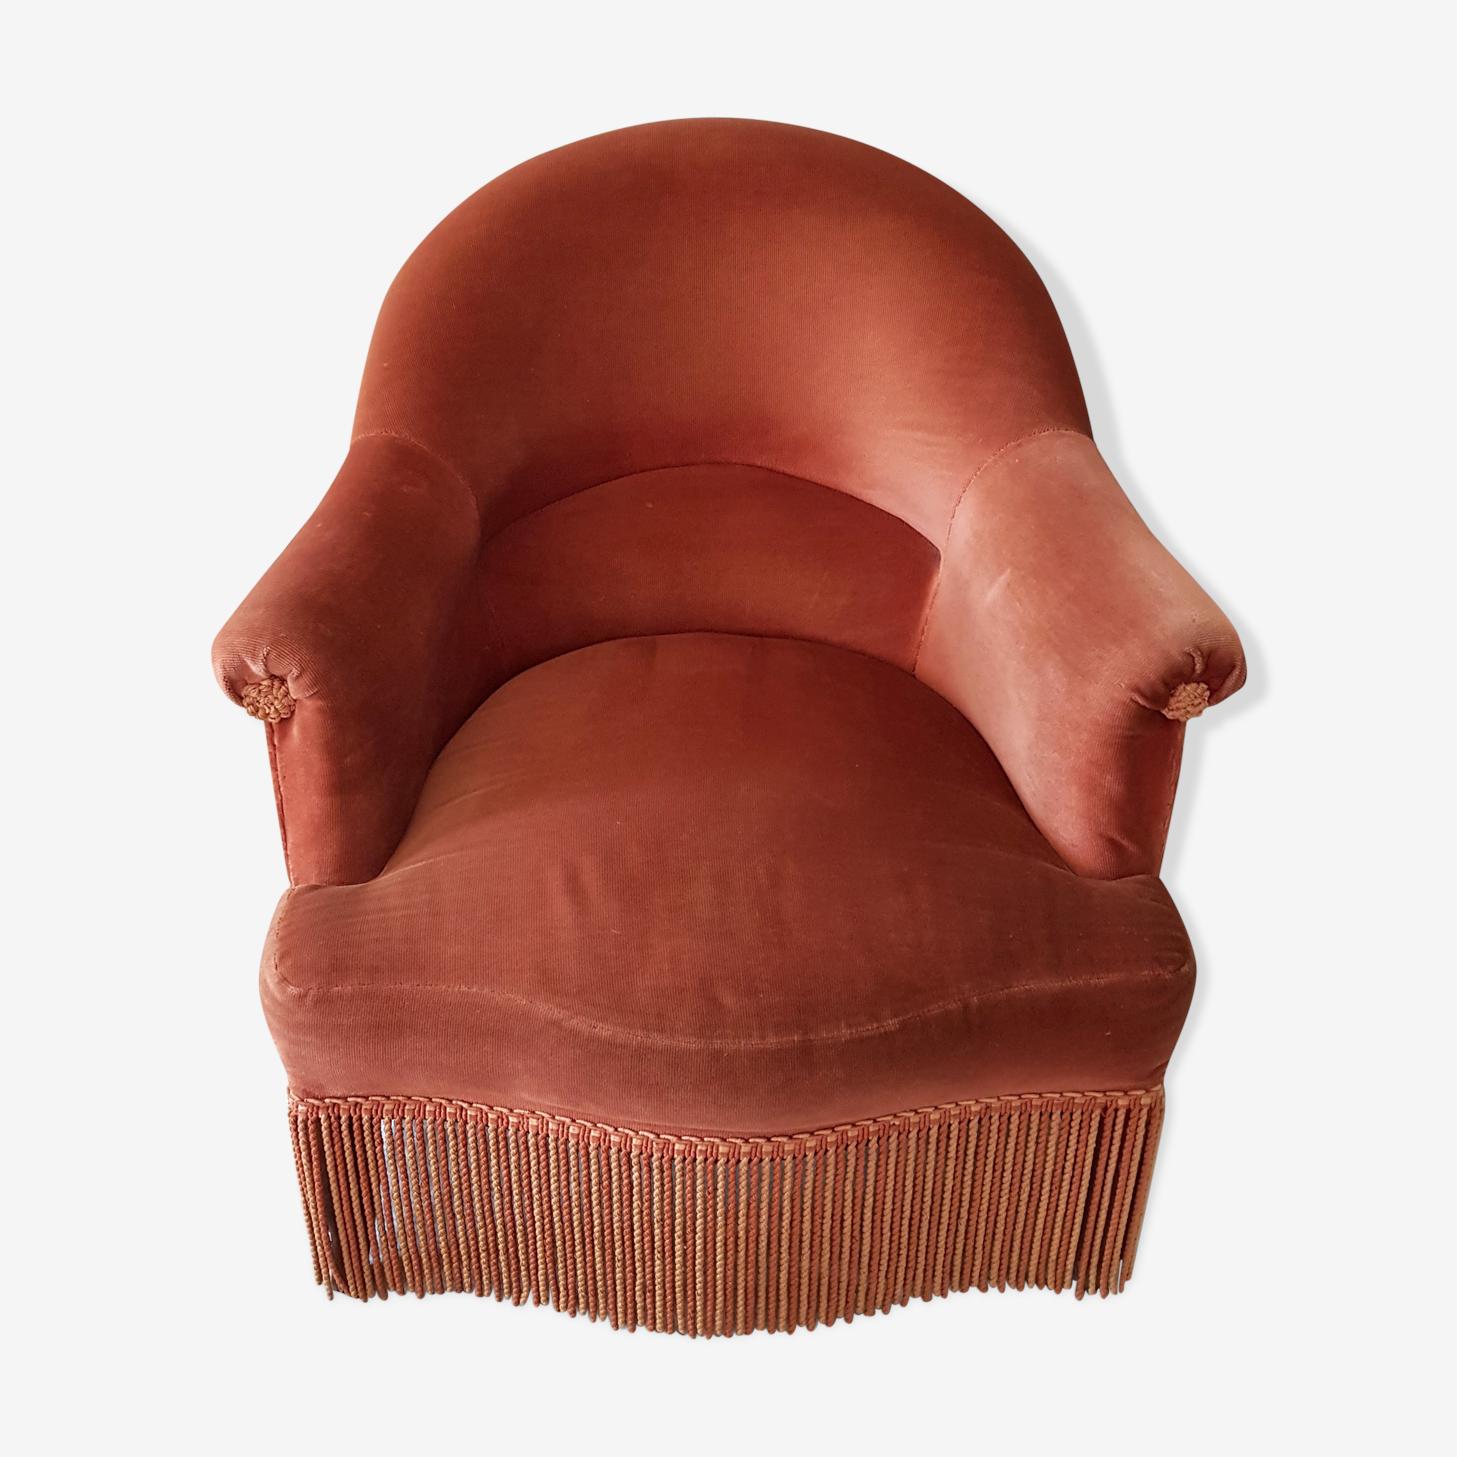 Toad in Velvet Chair